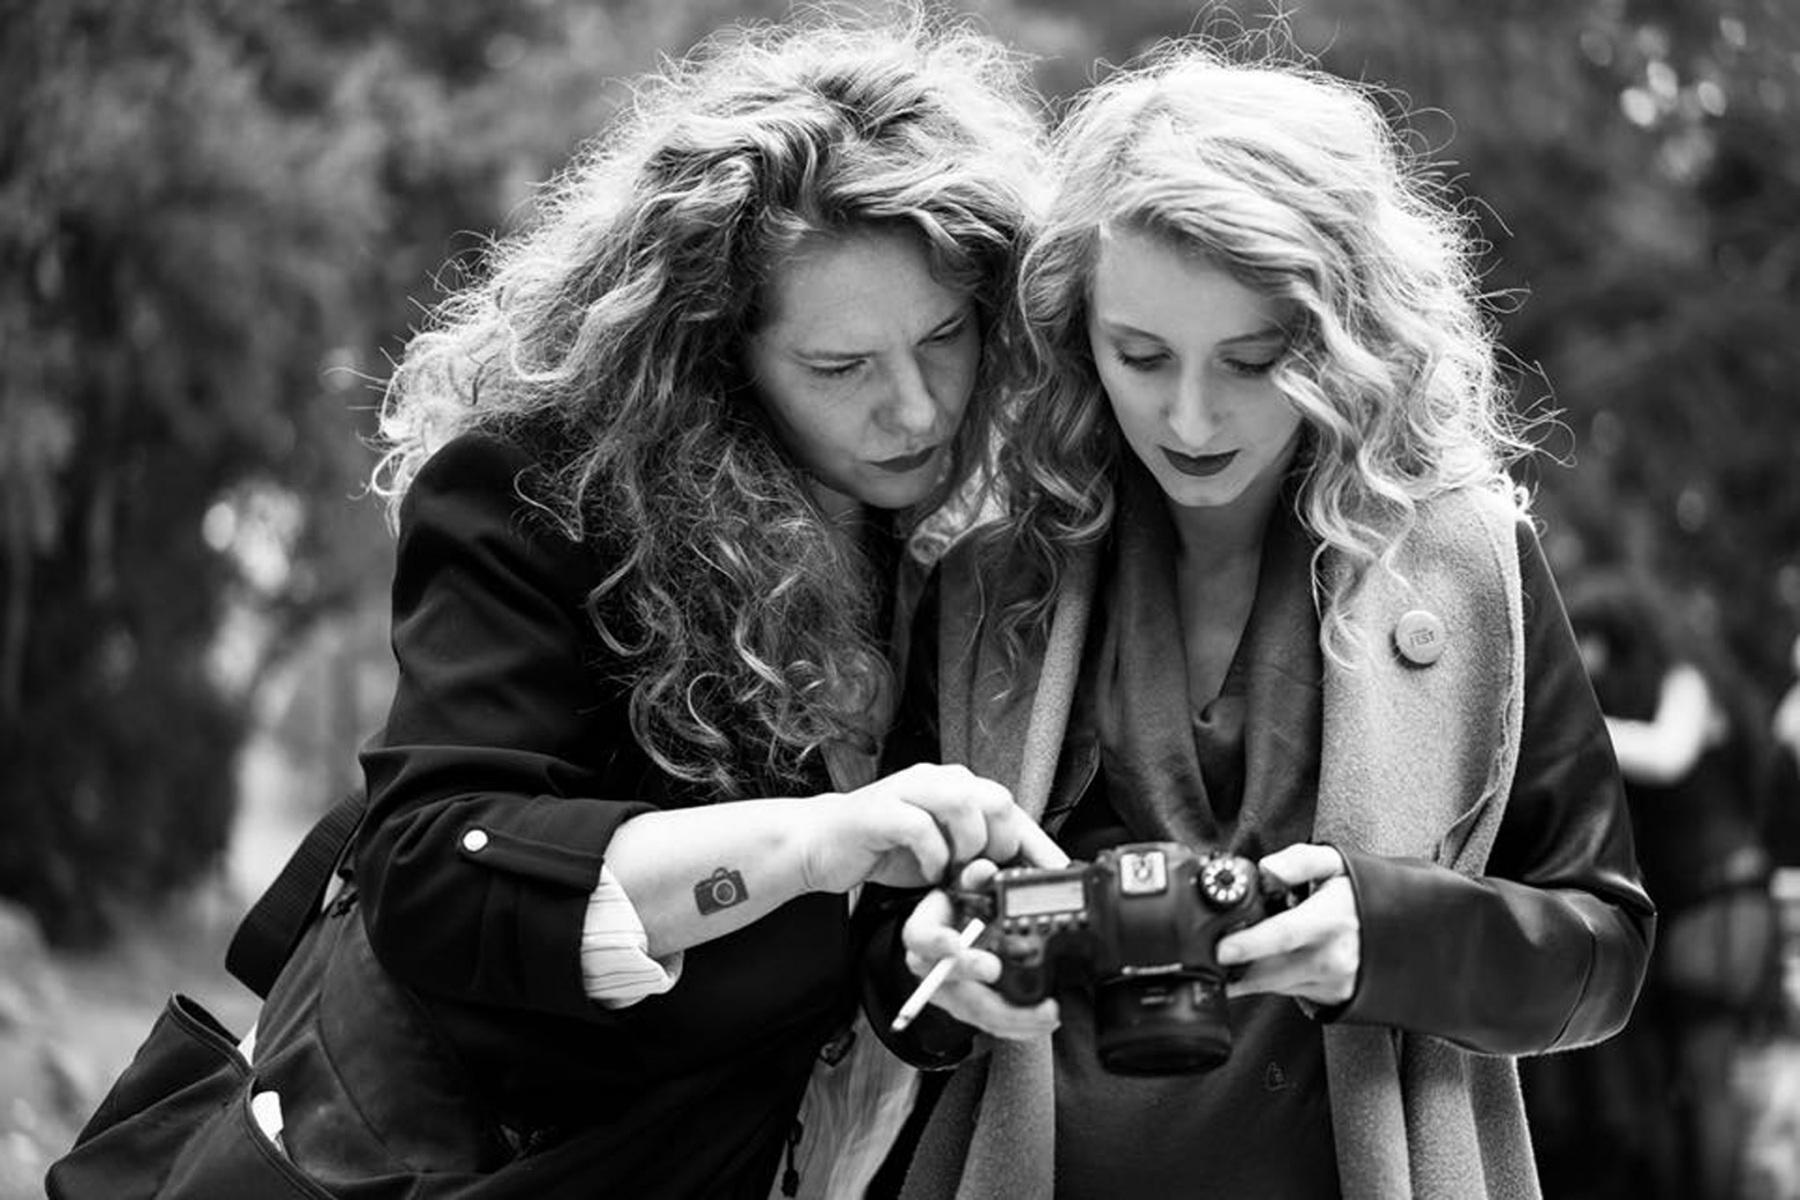 Katerina_Janisova_Masterclass_Workshop_Fotokurz-1